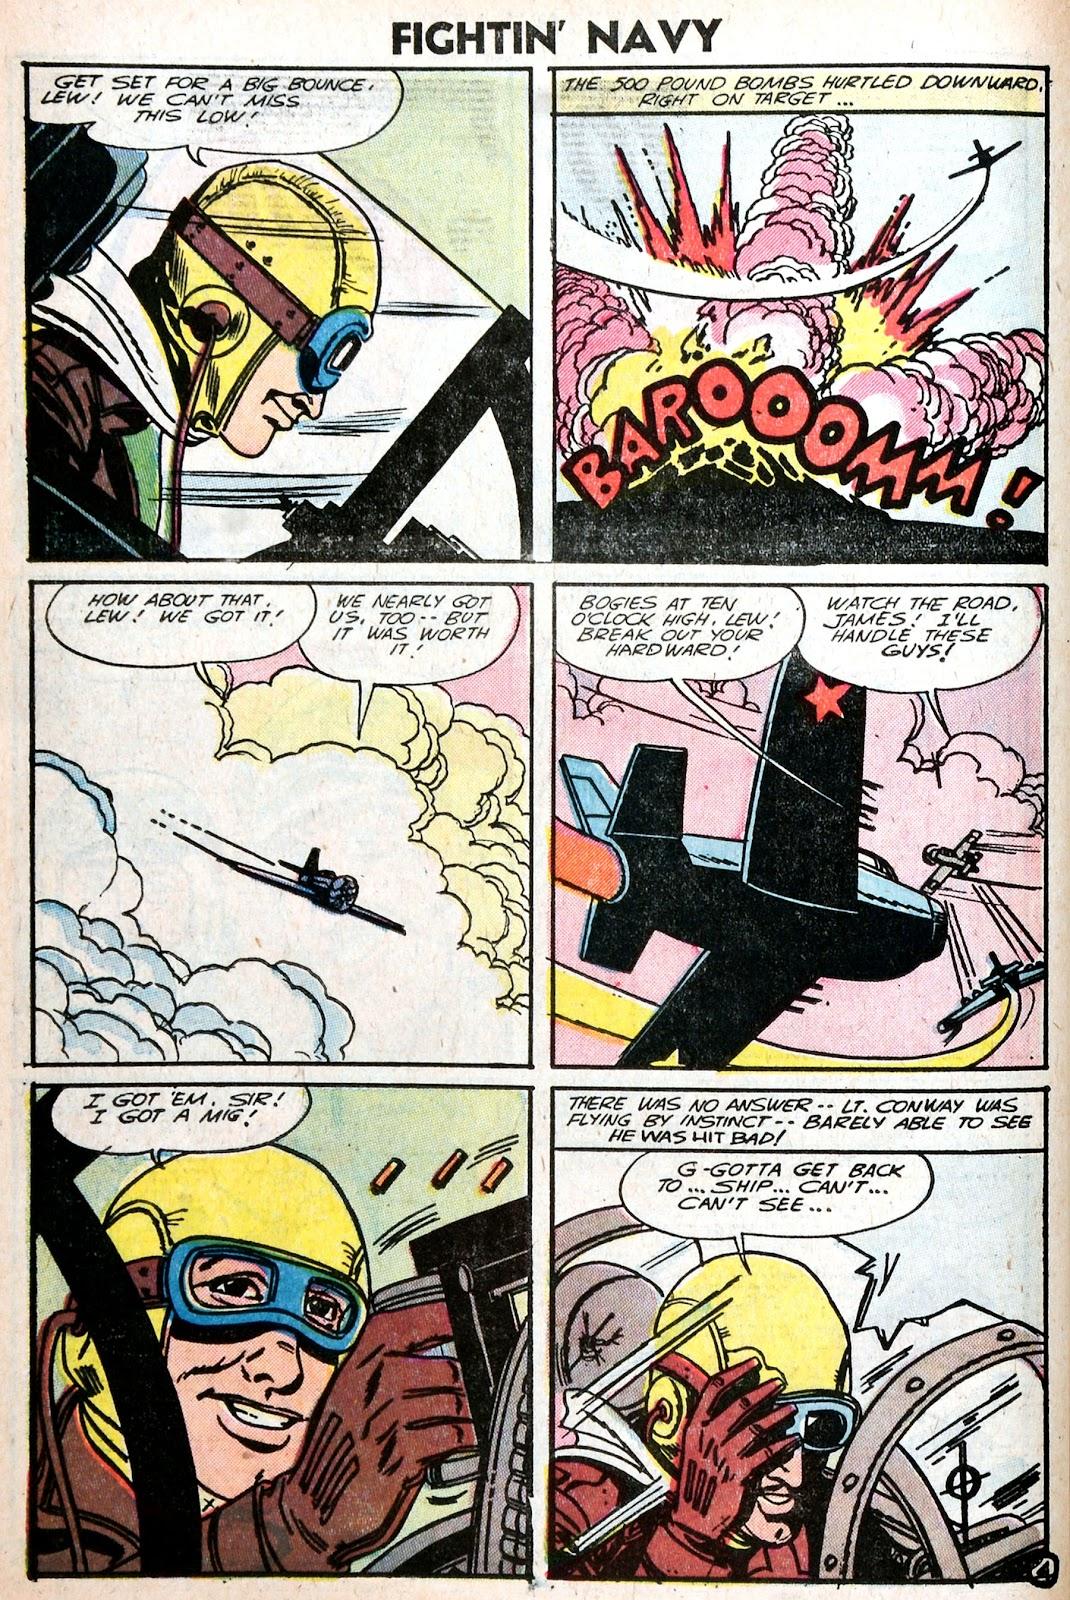 Read online Fightin' Navy comic -  Issue #75 - 14